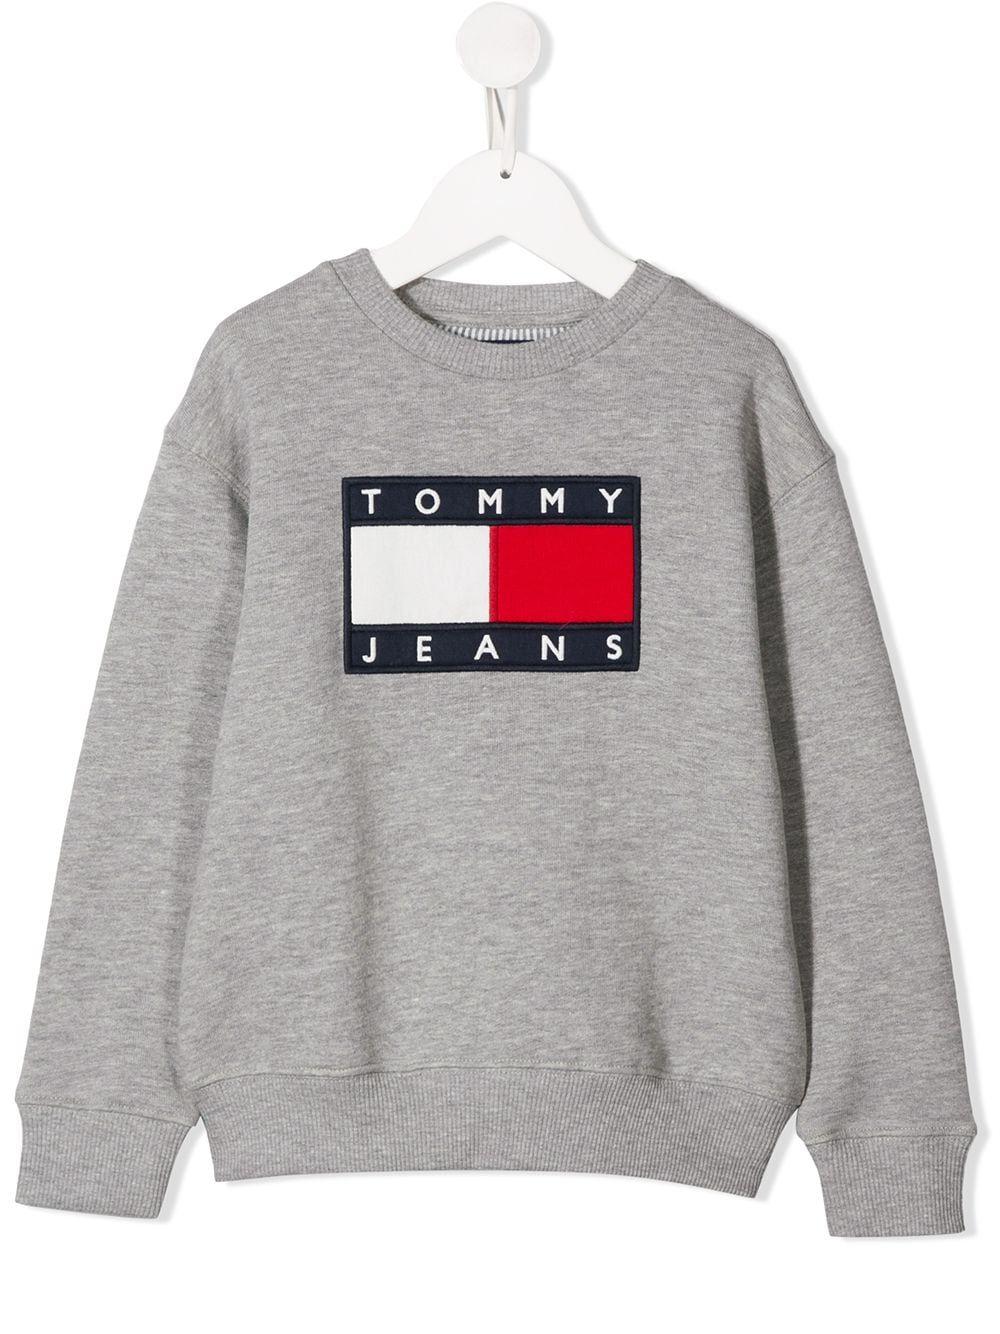 Tommy Hilfiger Junior Logo Print Sweatshirt Farfetch Tommy Hilfiger Sweatshirt Tommy Hilfiger Outfit Printed Sweatshirt Women [ 1334 x 1000 Pixel ]